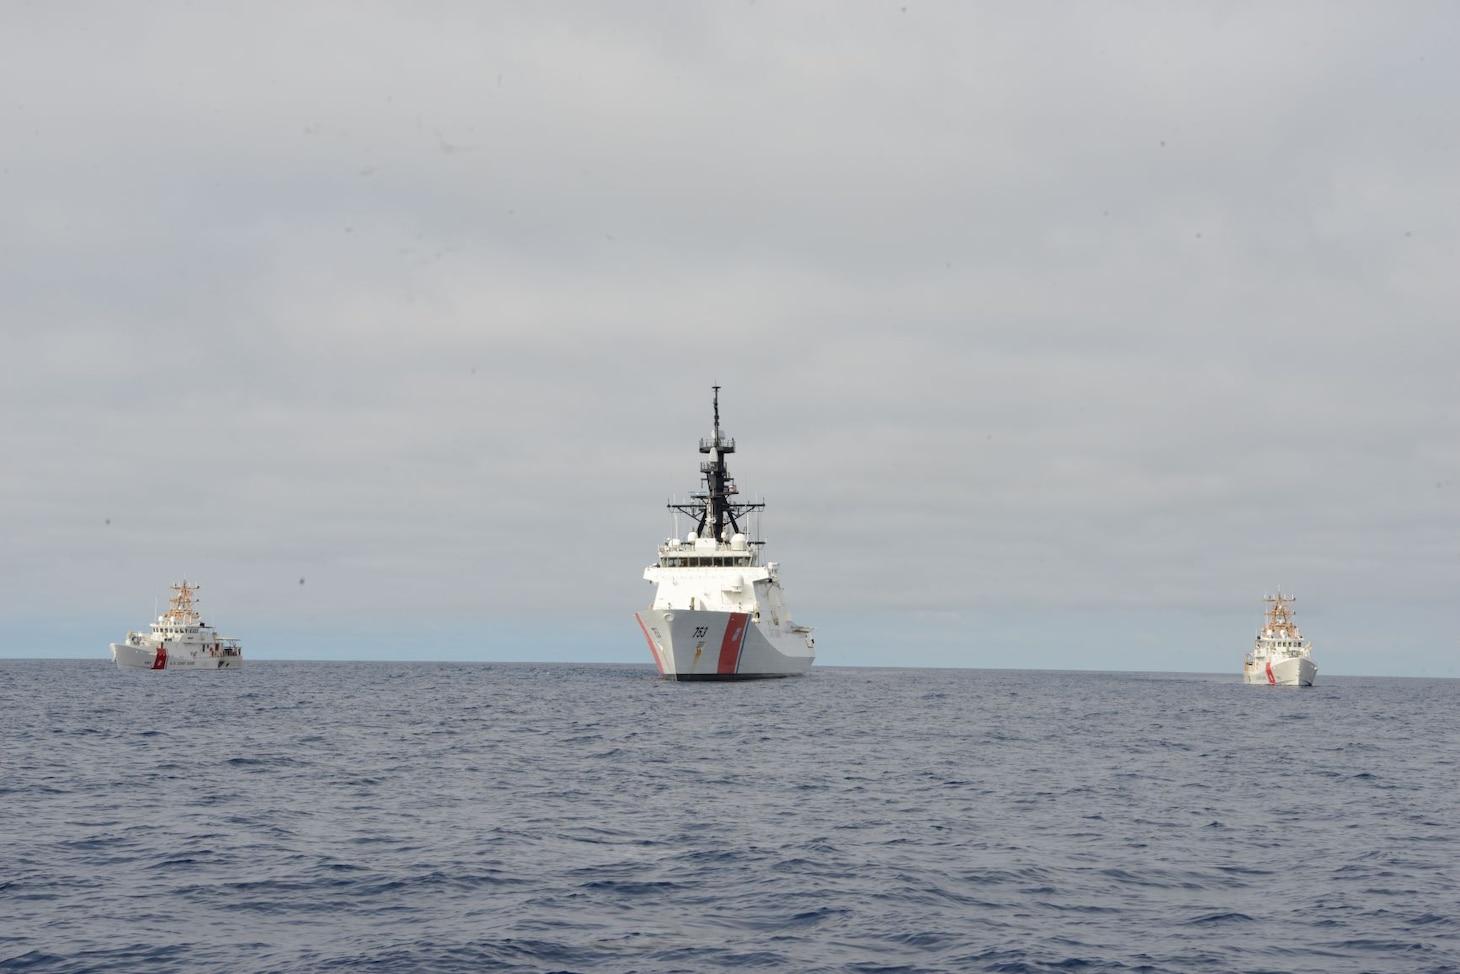 U.S. Coast Guard; USCGC Hamilton (WMSL 753)